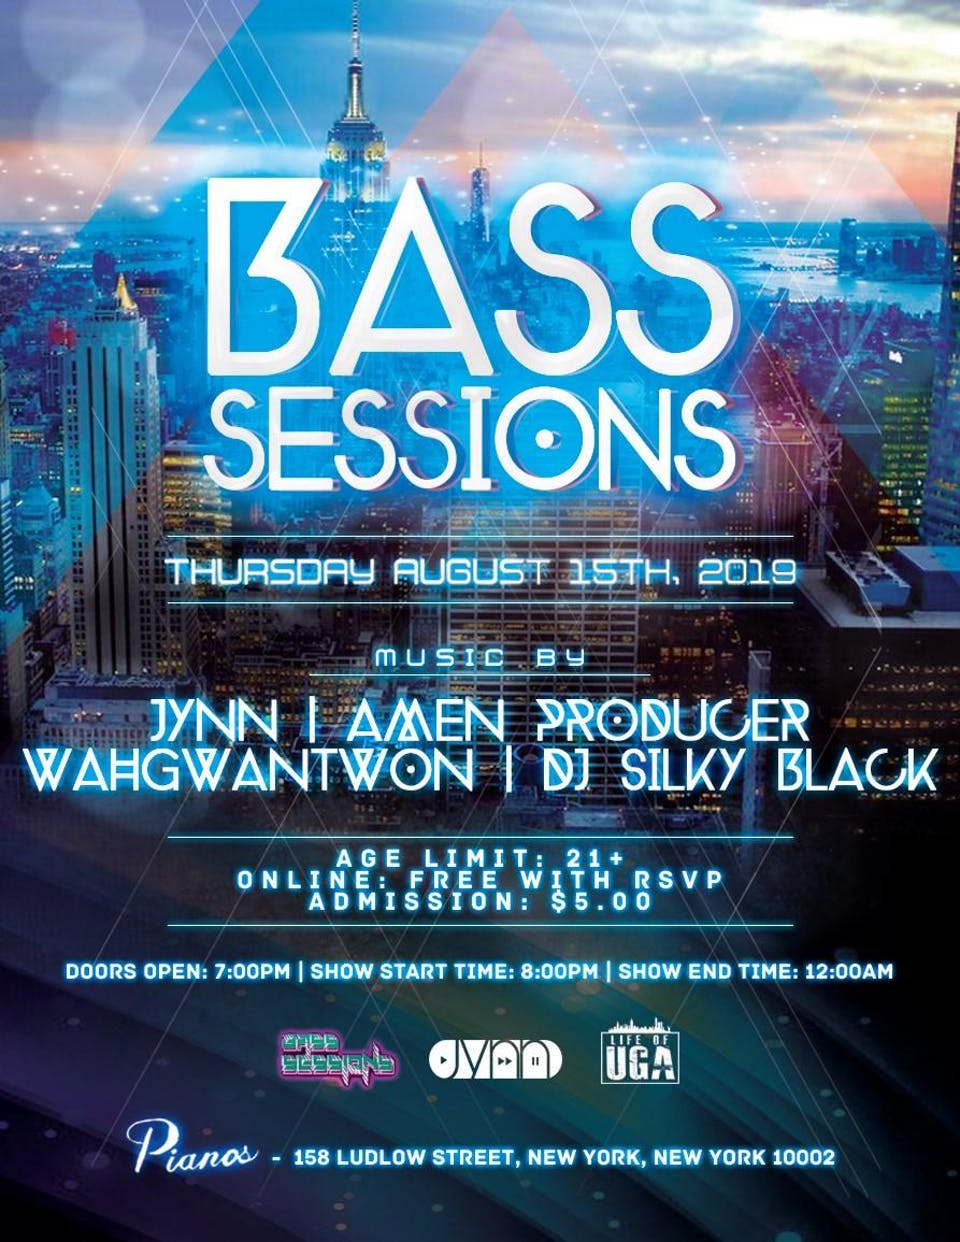 Bass Sessions with Jynn, Silky Black, Amen the Producer & Wah Gwon Twon